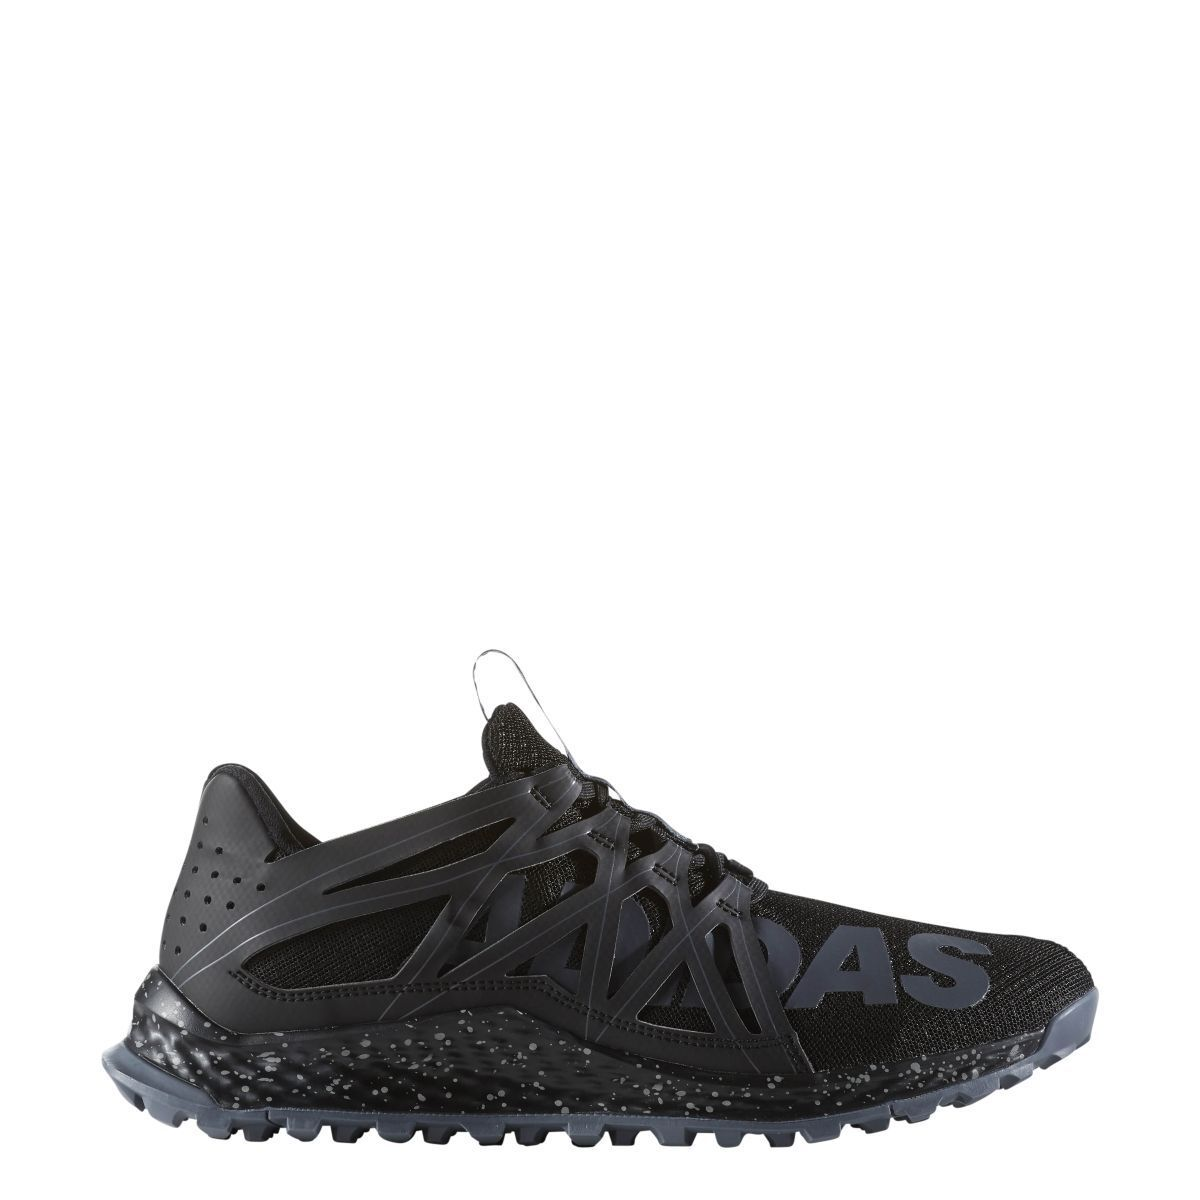 NWT Homme Adidas Vigor Bounce Noir Athletic Trail Chaussures BW032018 Kanadia Thrasher